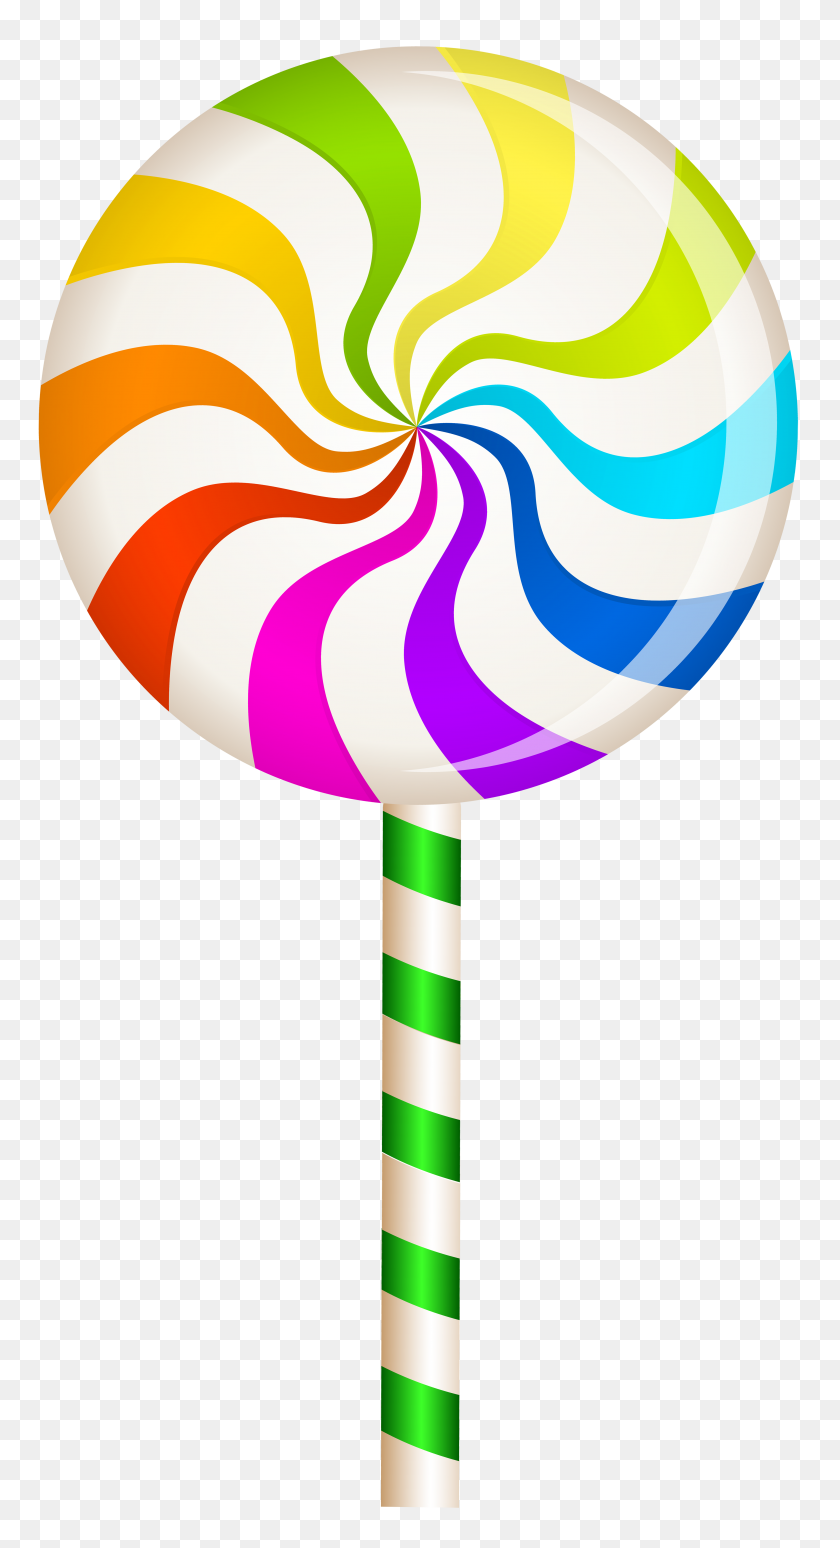 Sweets Lollipop Clipart, Explore Pictures - Sweet Treats Clipart